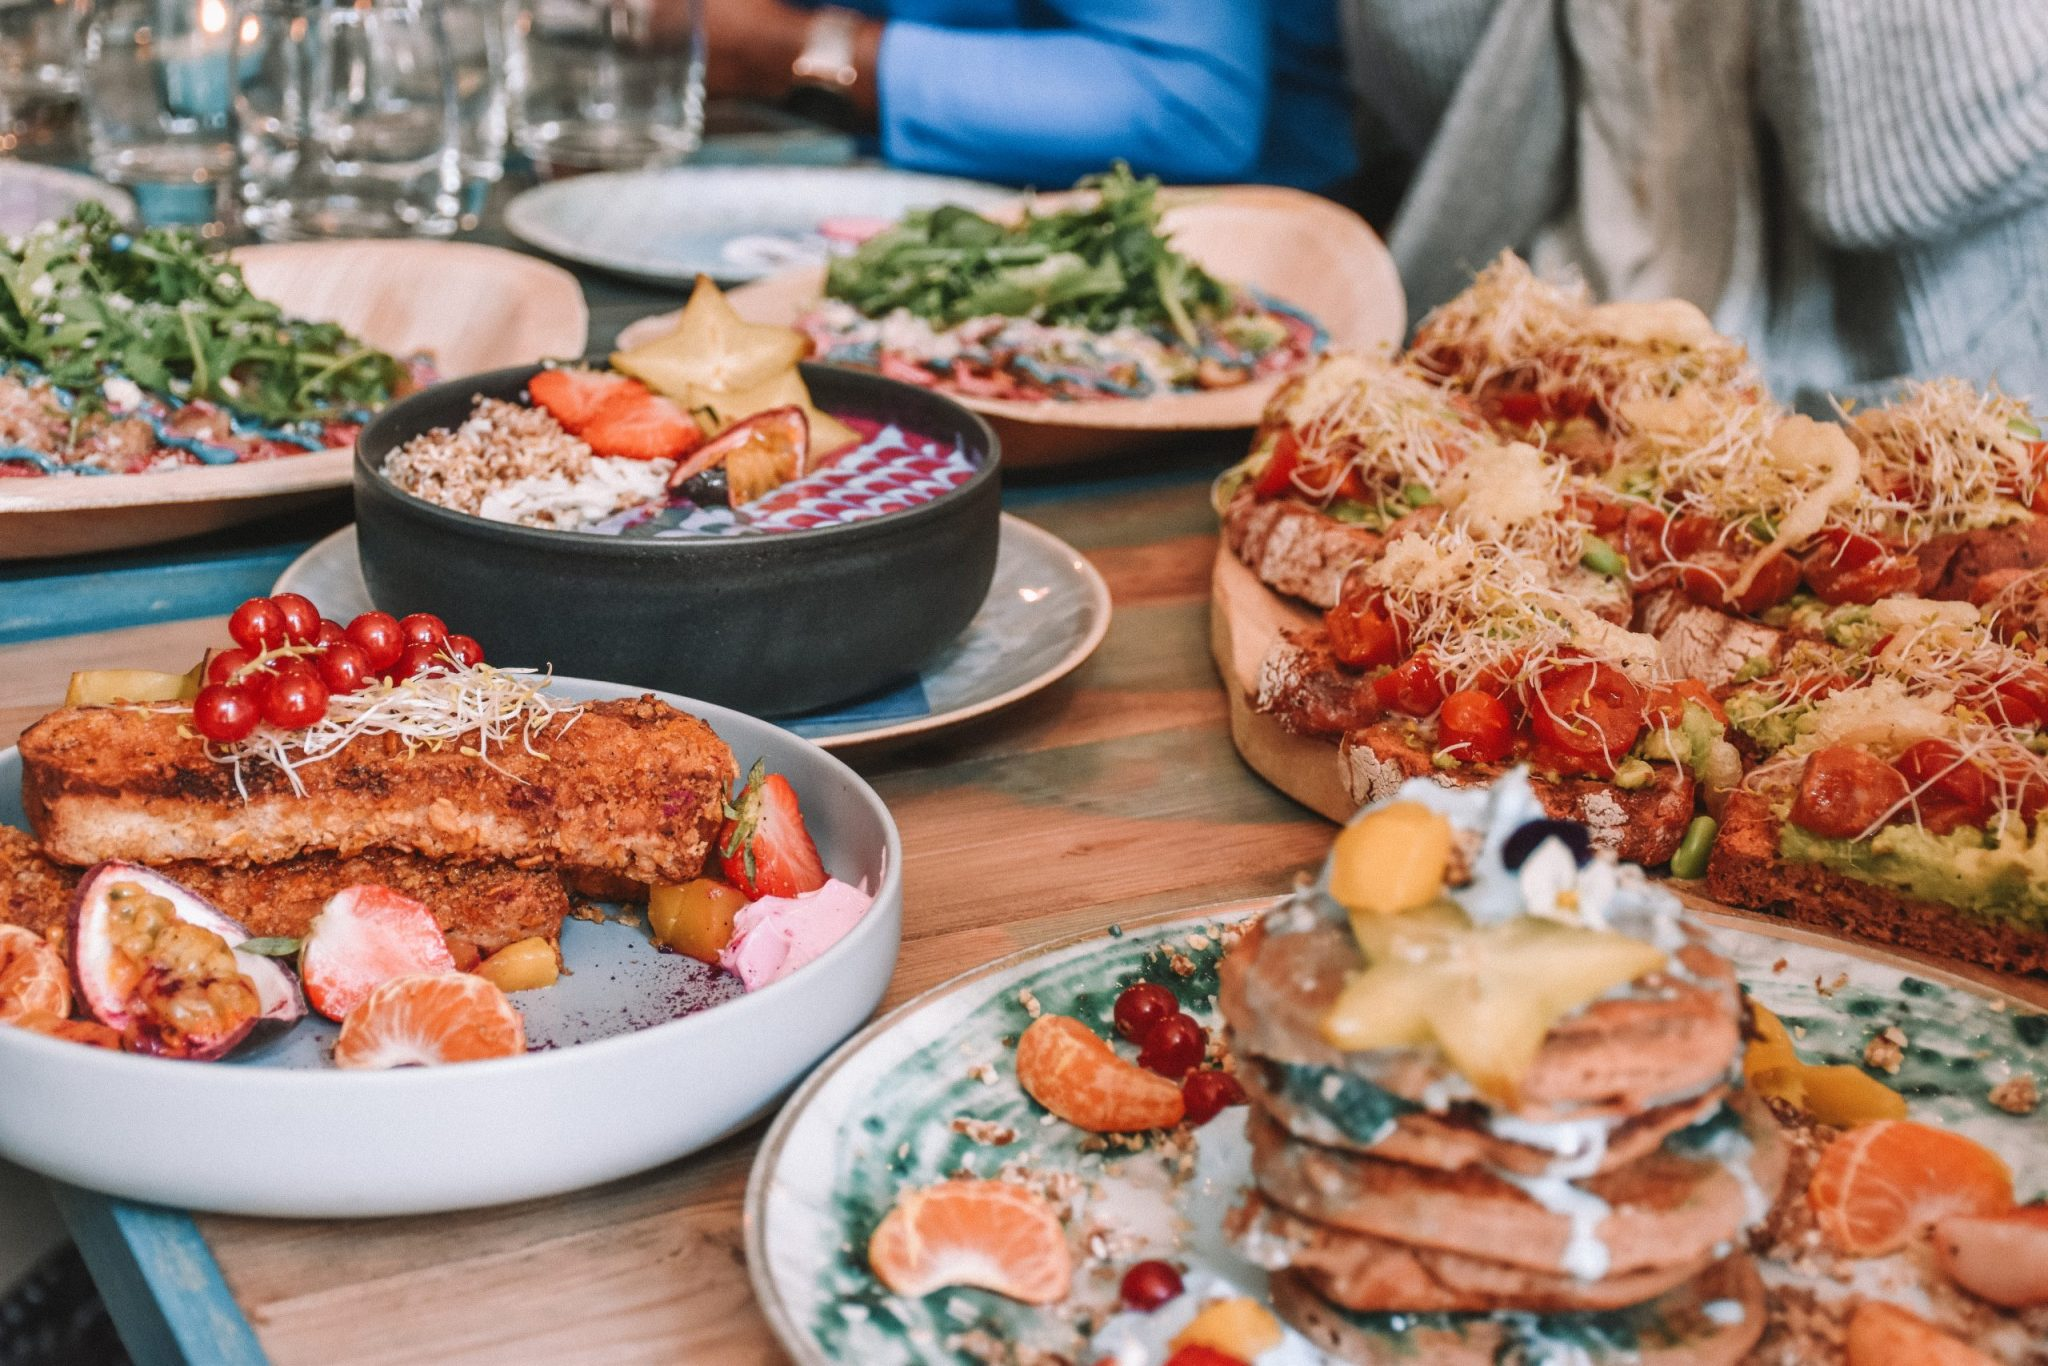 food mugs and mermaids den haag